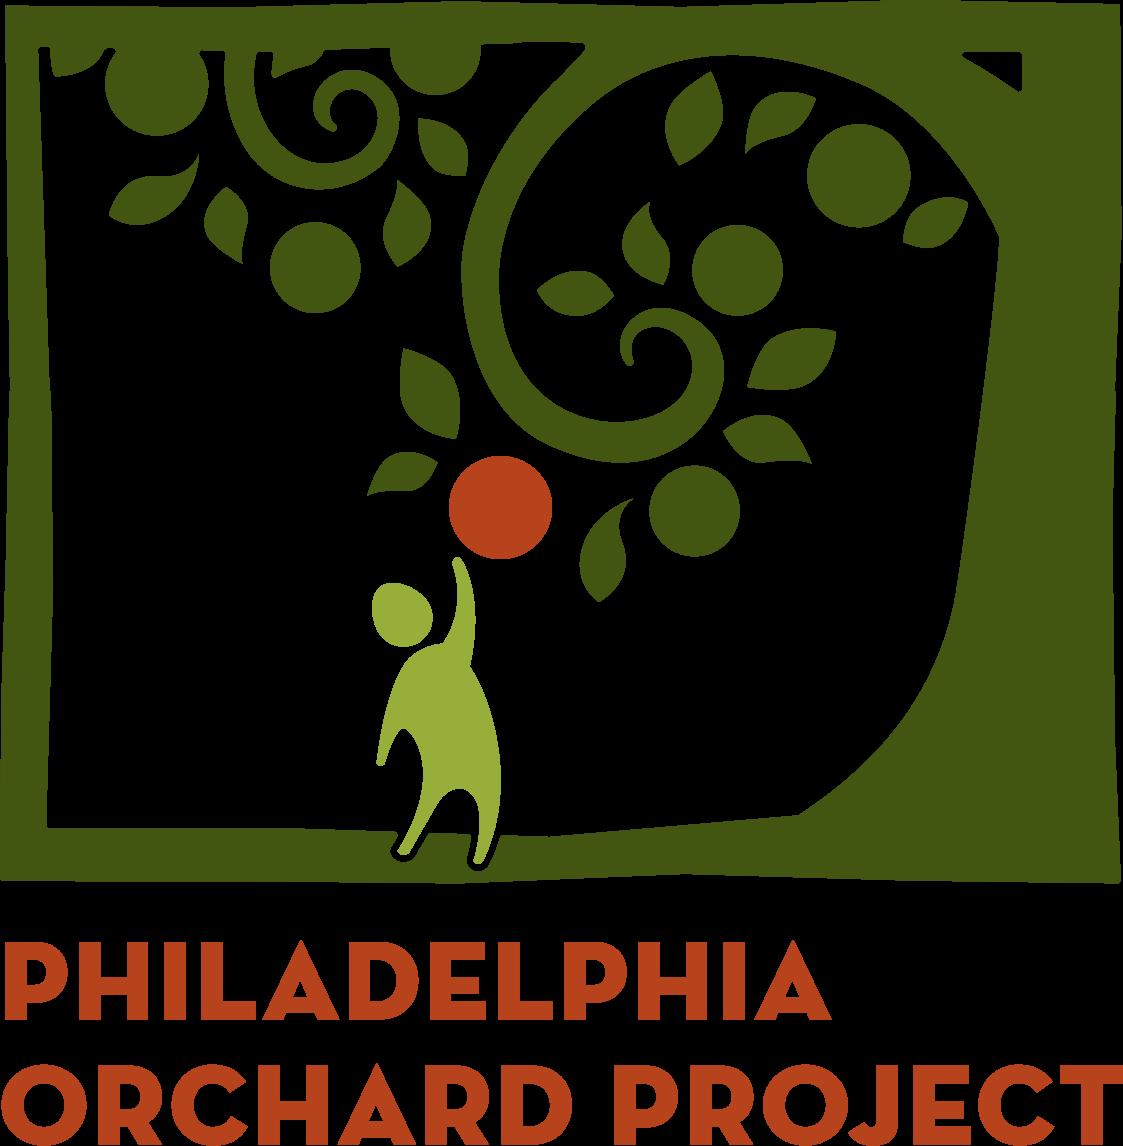 Philadelphia Orchard Project logo